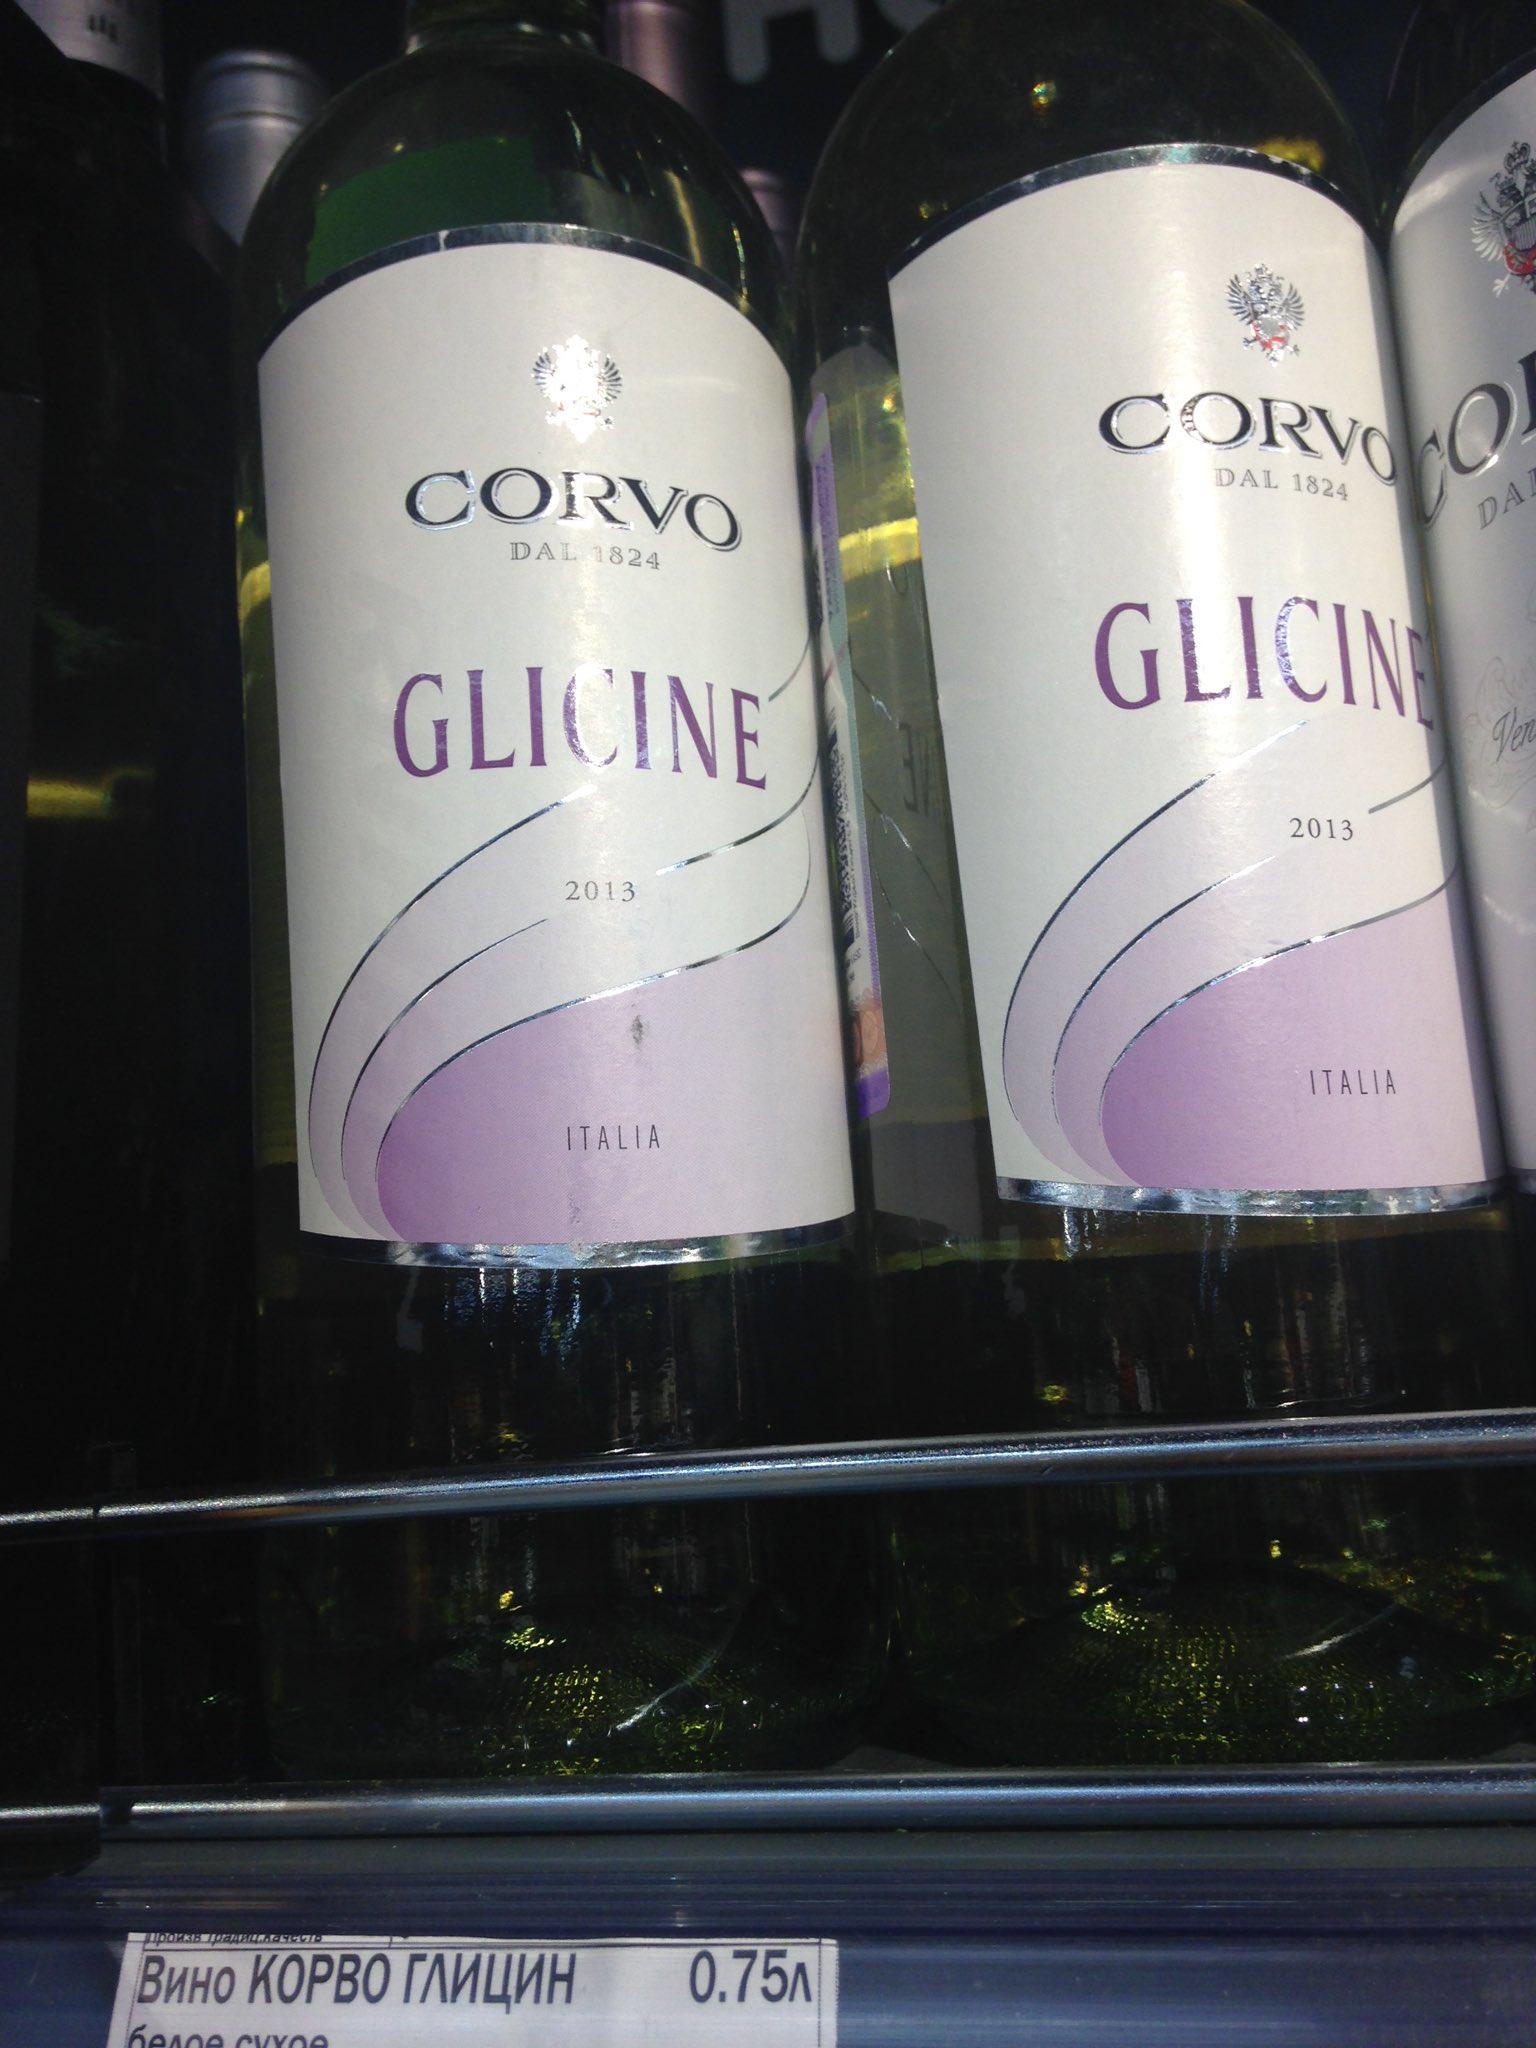 Поттер, картинка с вином глицин